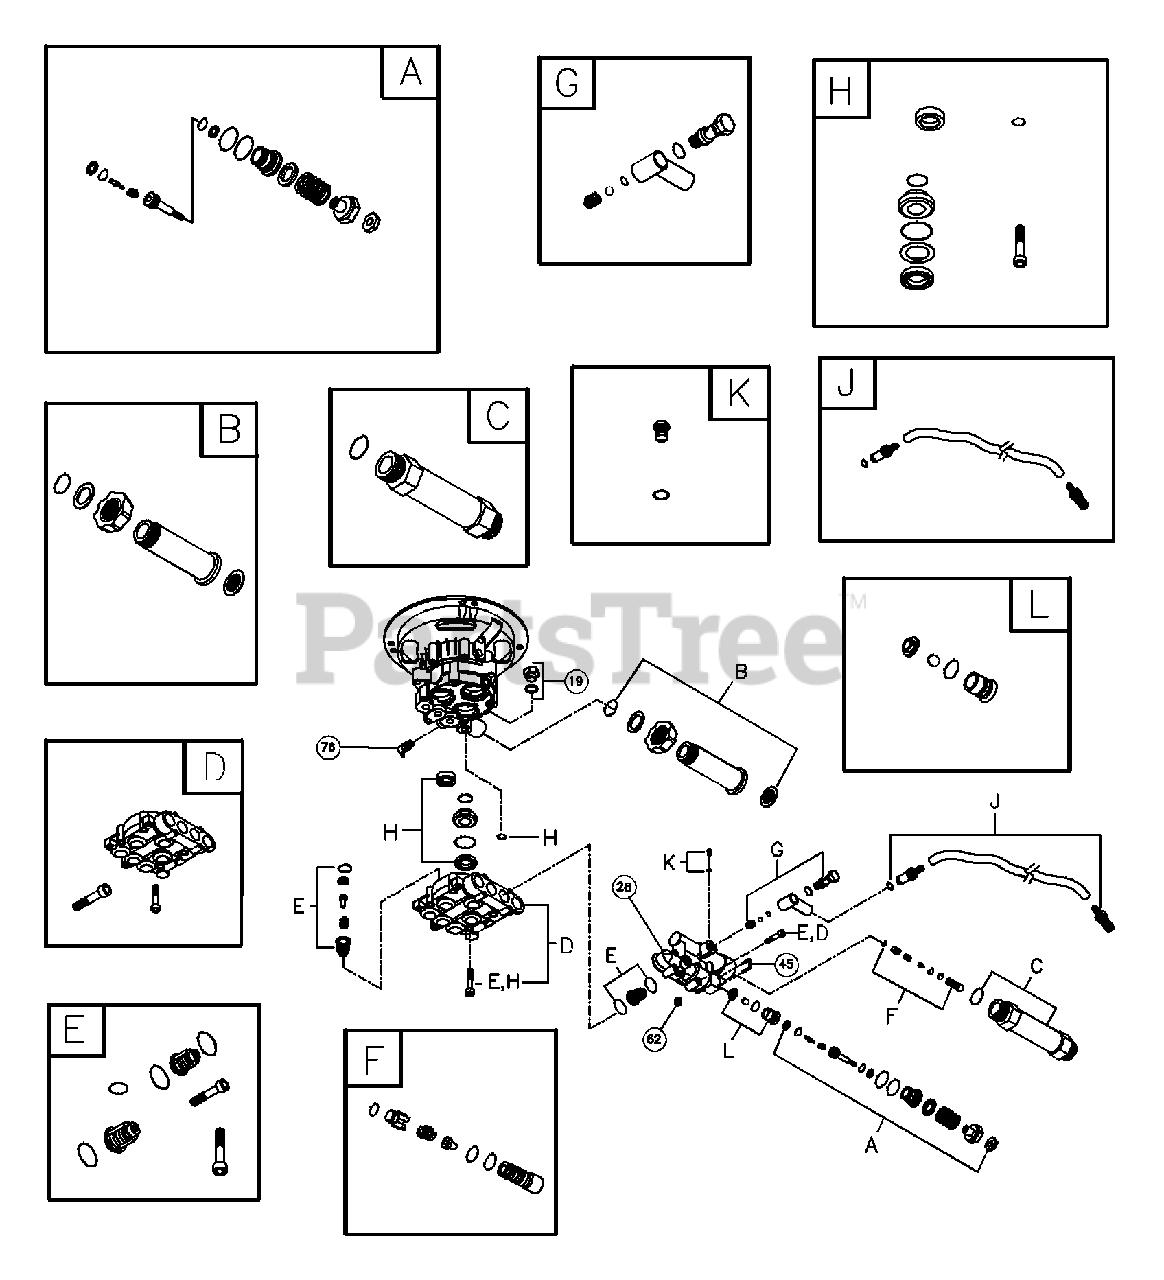 Troy-Bilt 020207-1 - Troy-Bilt 2,450 PSI Pressure Washer ...